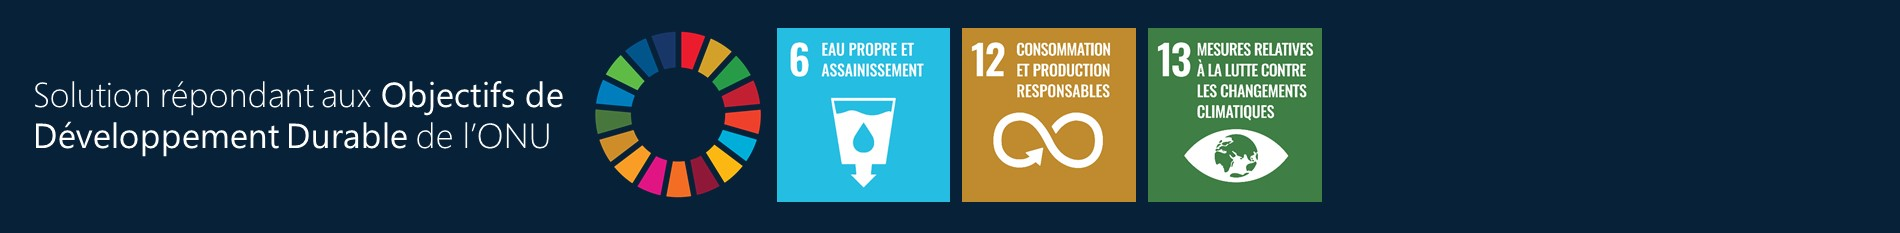 Objectifs Developpement Durable ONU SIG KIS Altereo